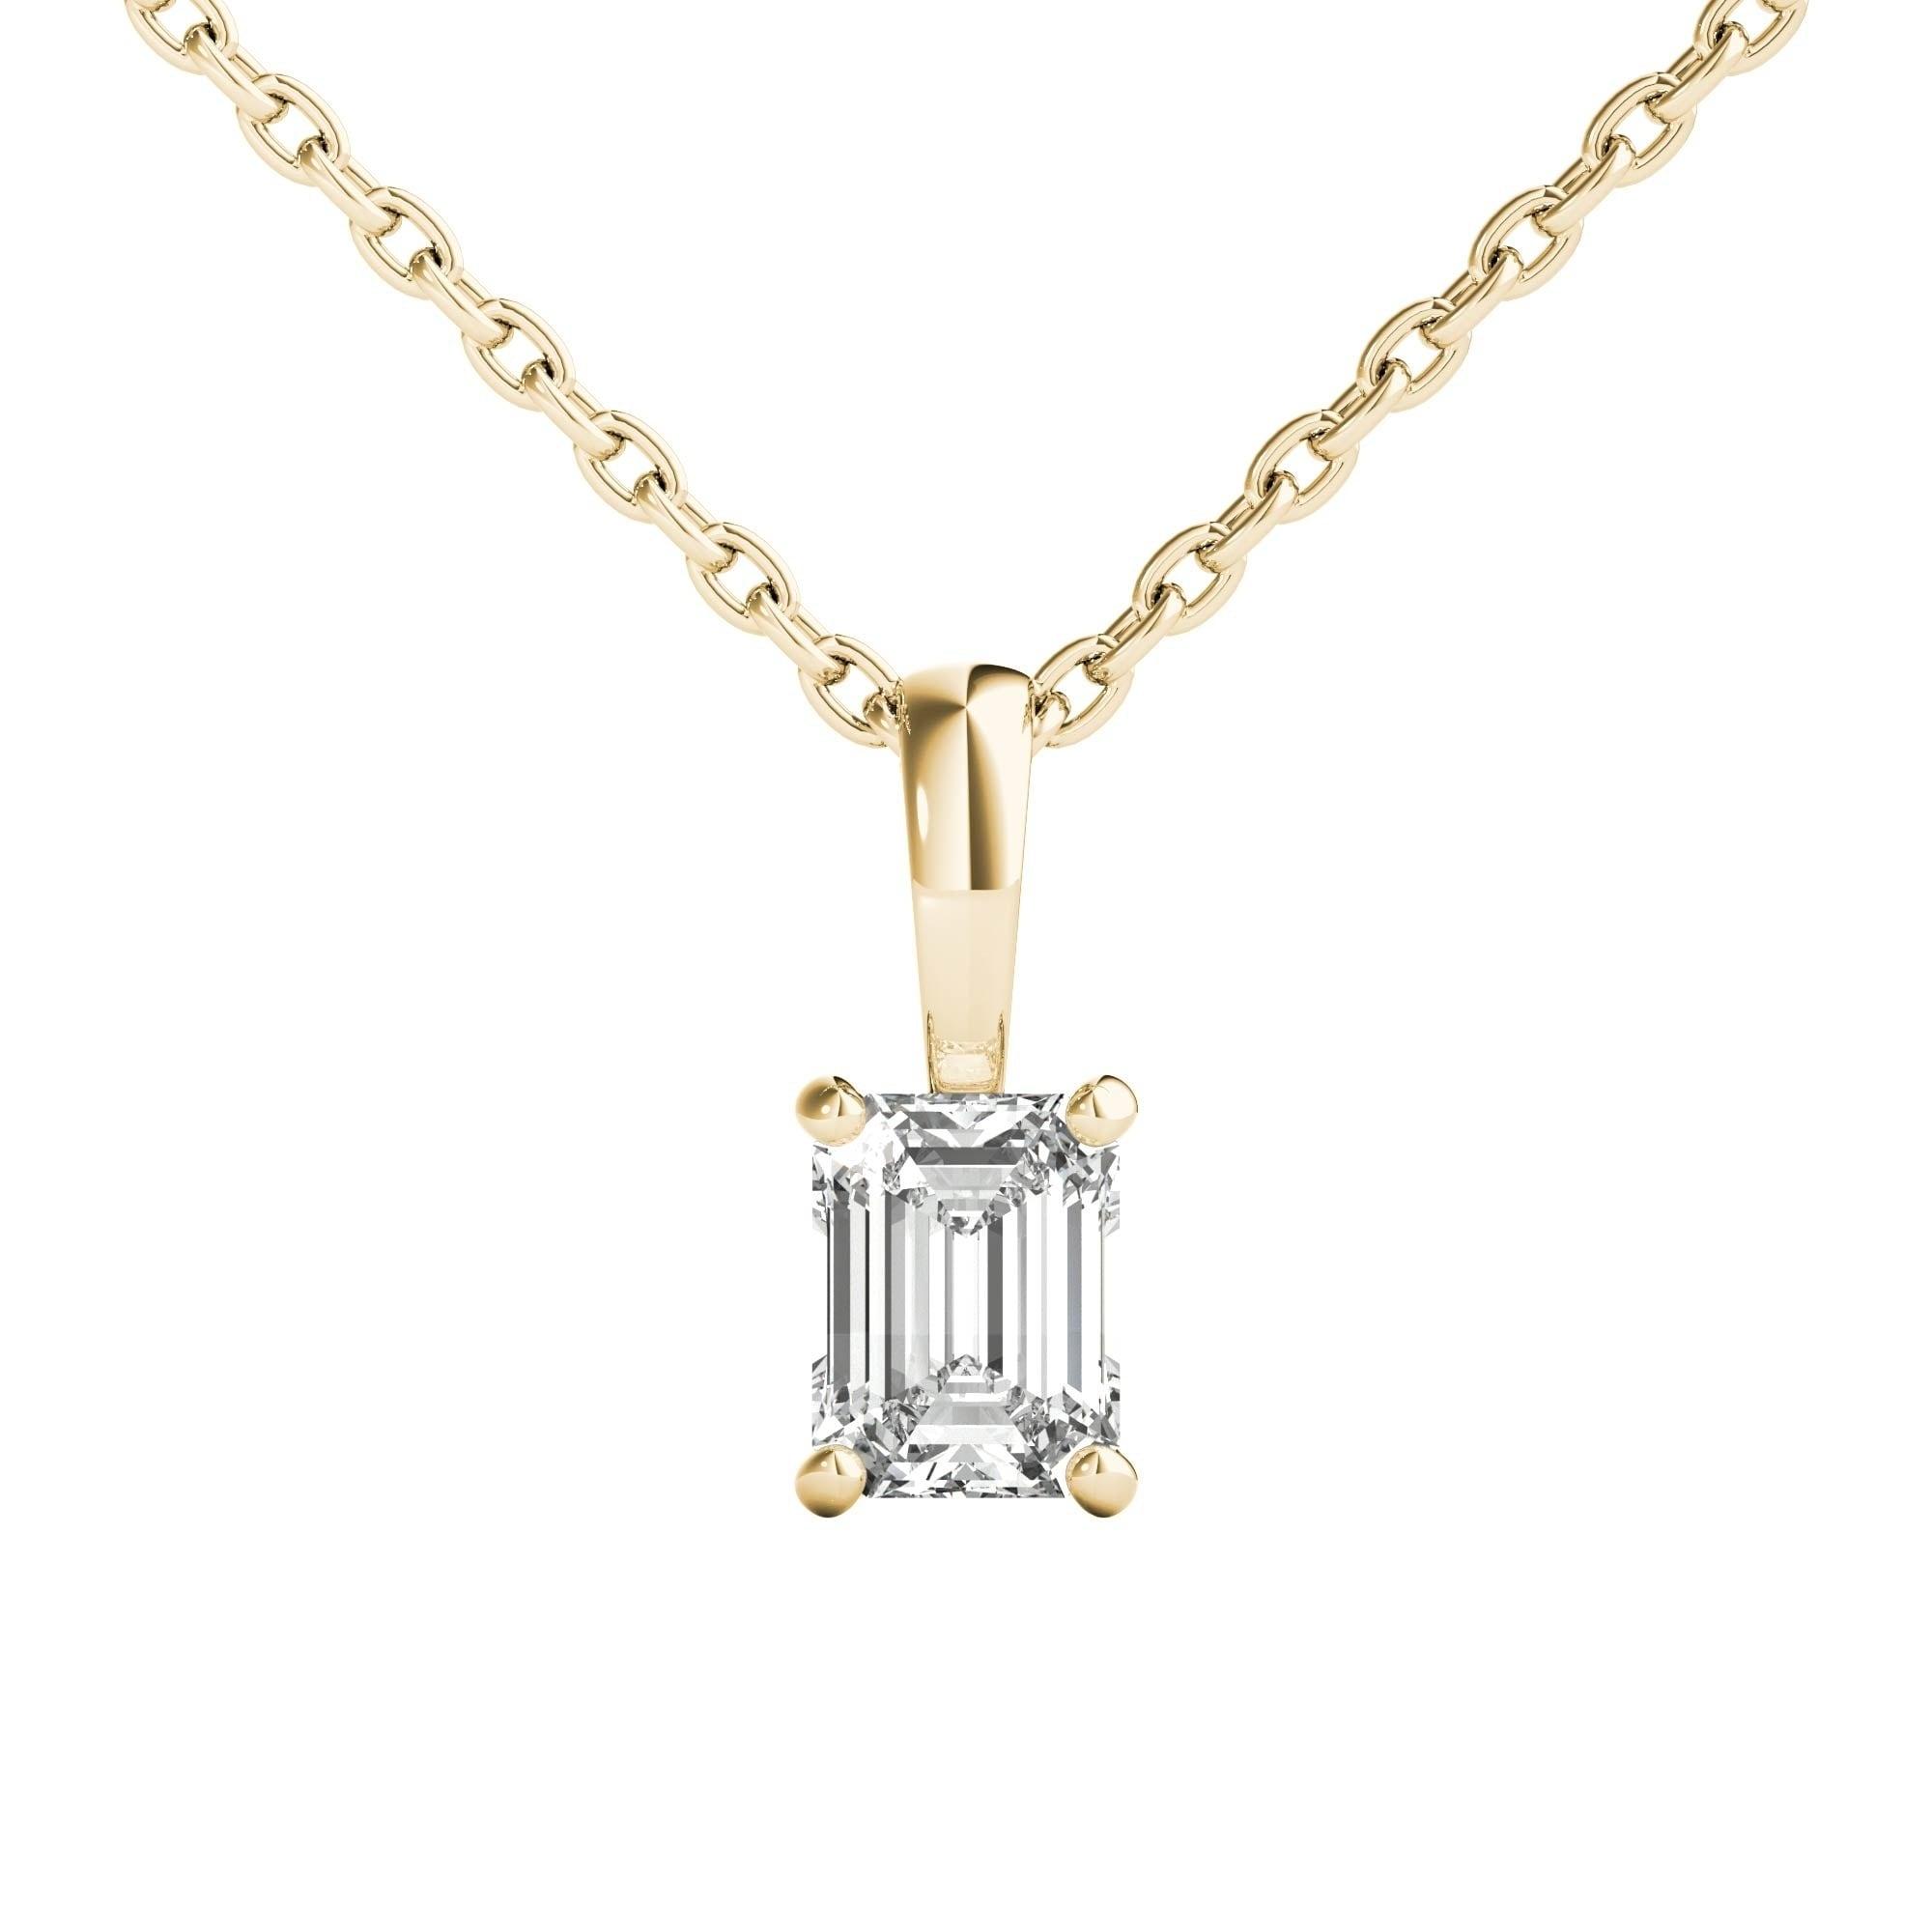 Seraphina 18k gold 030ct tdw emerald cut diamond pendant necklace seraphina 18k gold 030ct tdw emerald cut diamond pendant necklace free shipping today overstock 26975395 aloadofball Choice Image